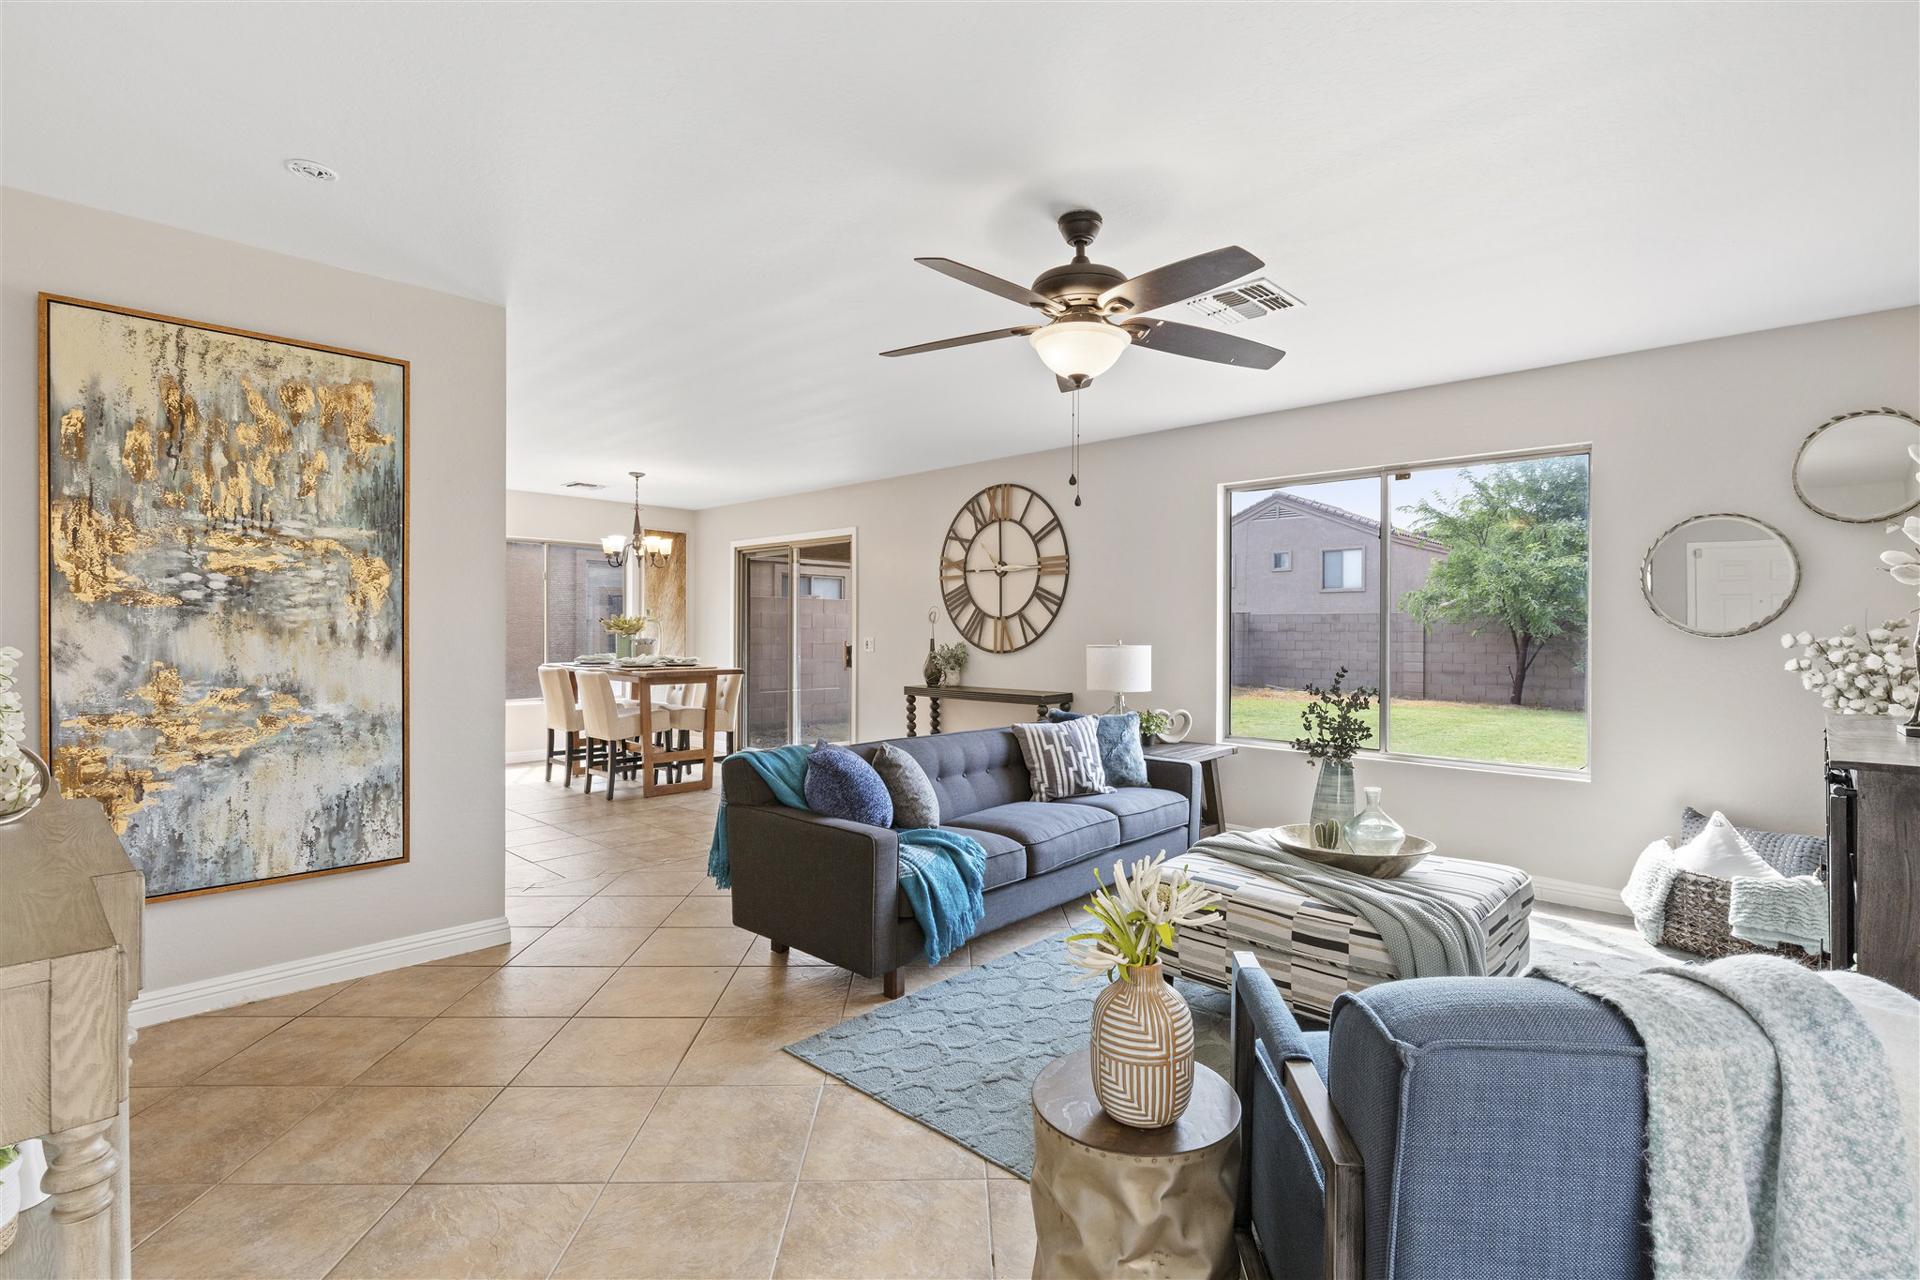 UNDER CONTRACT - 11023 E Arbor Ave, Mesa, AZ - SIgnal Butte Manor | Amy Jones Group